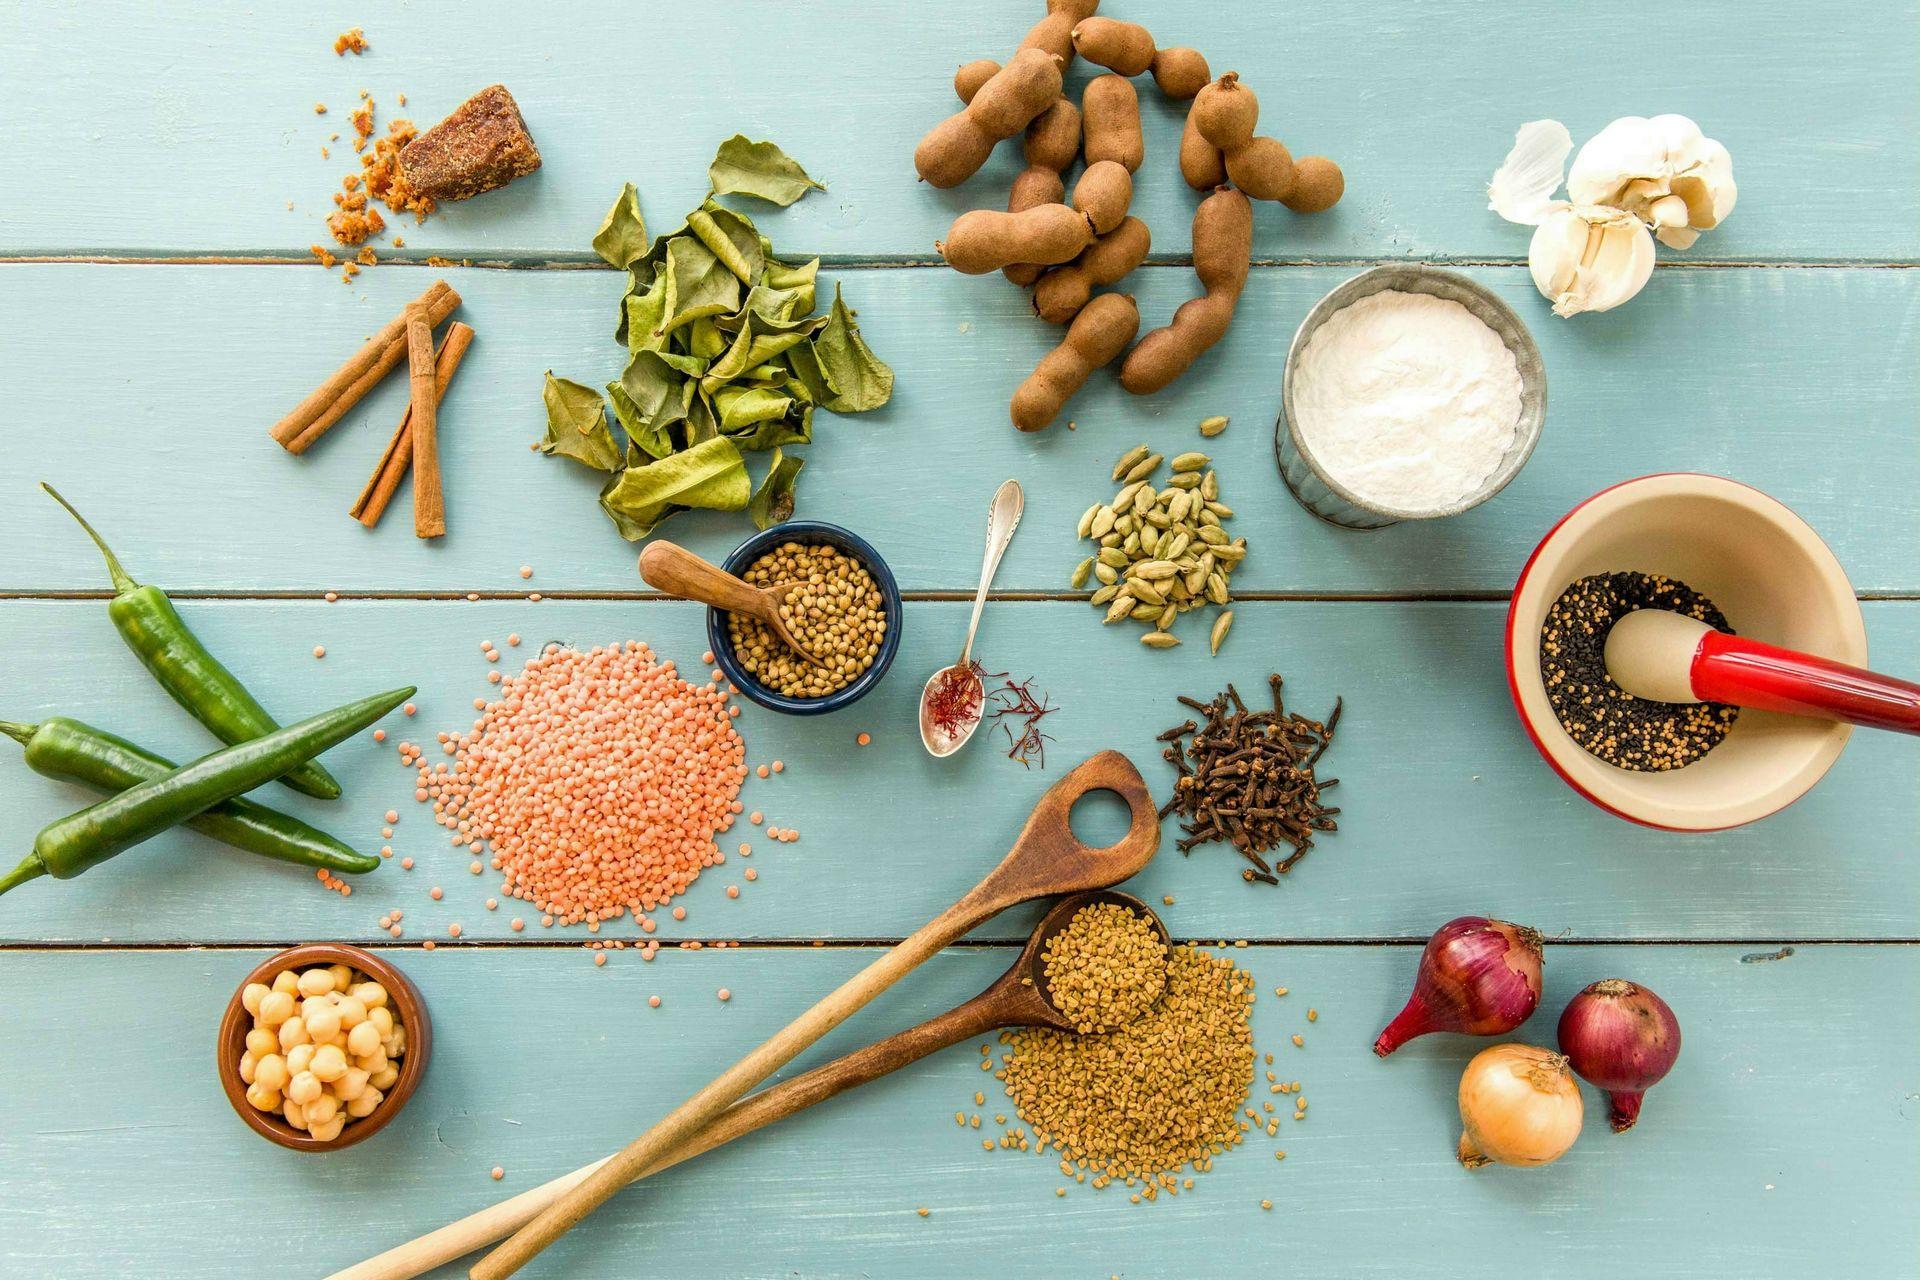 hf160211_global_blog_2_asia-ingredient_01_low-1-cooking